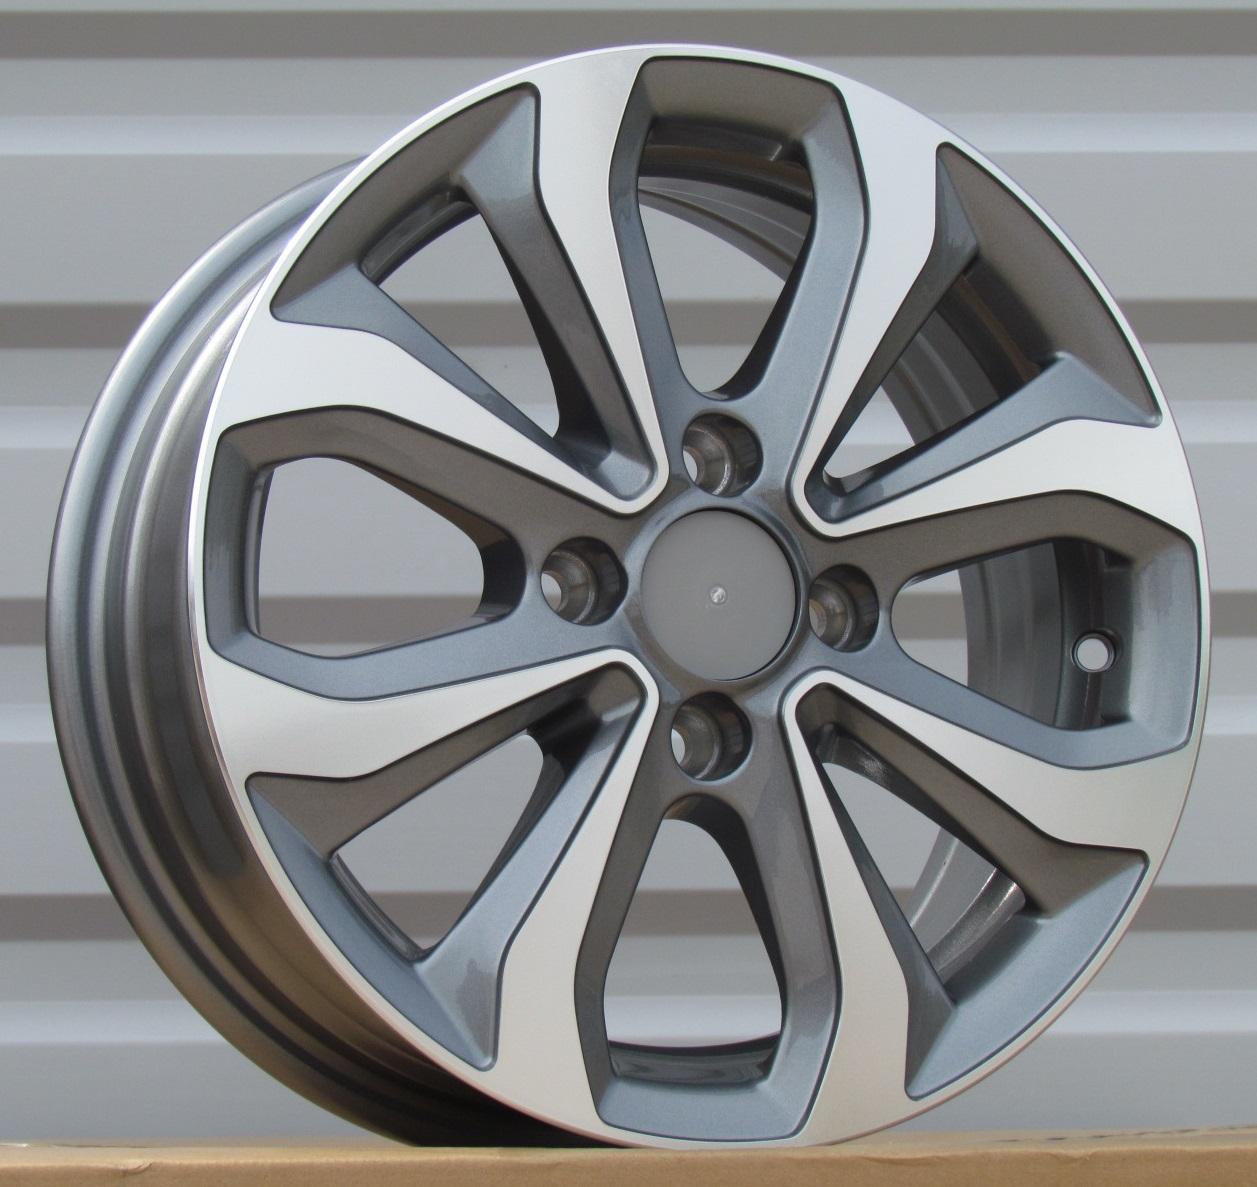 ALU PLATIŠČA R14X5.5 4X100 ET38 54.1 XFE275 MG+POWDER COATING RWR Hyundai (+2eur (P1)## 5.5x14 ET38 4x100